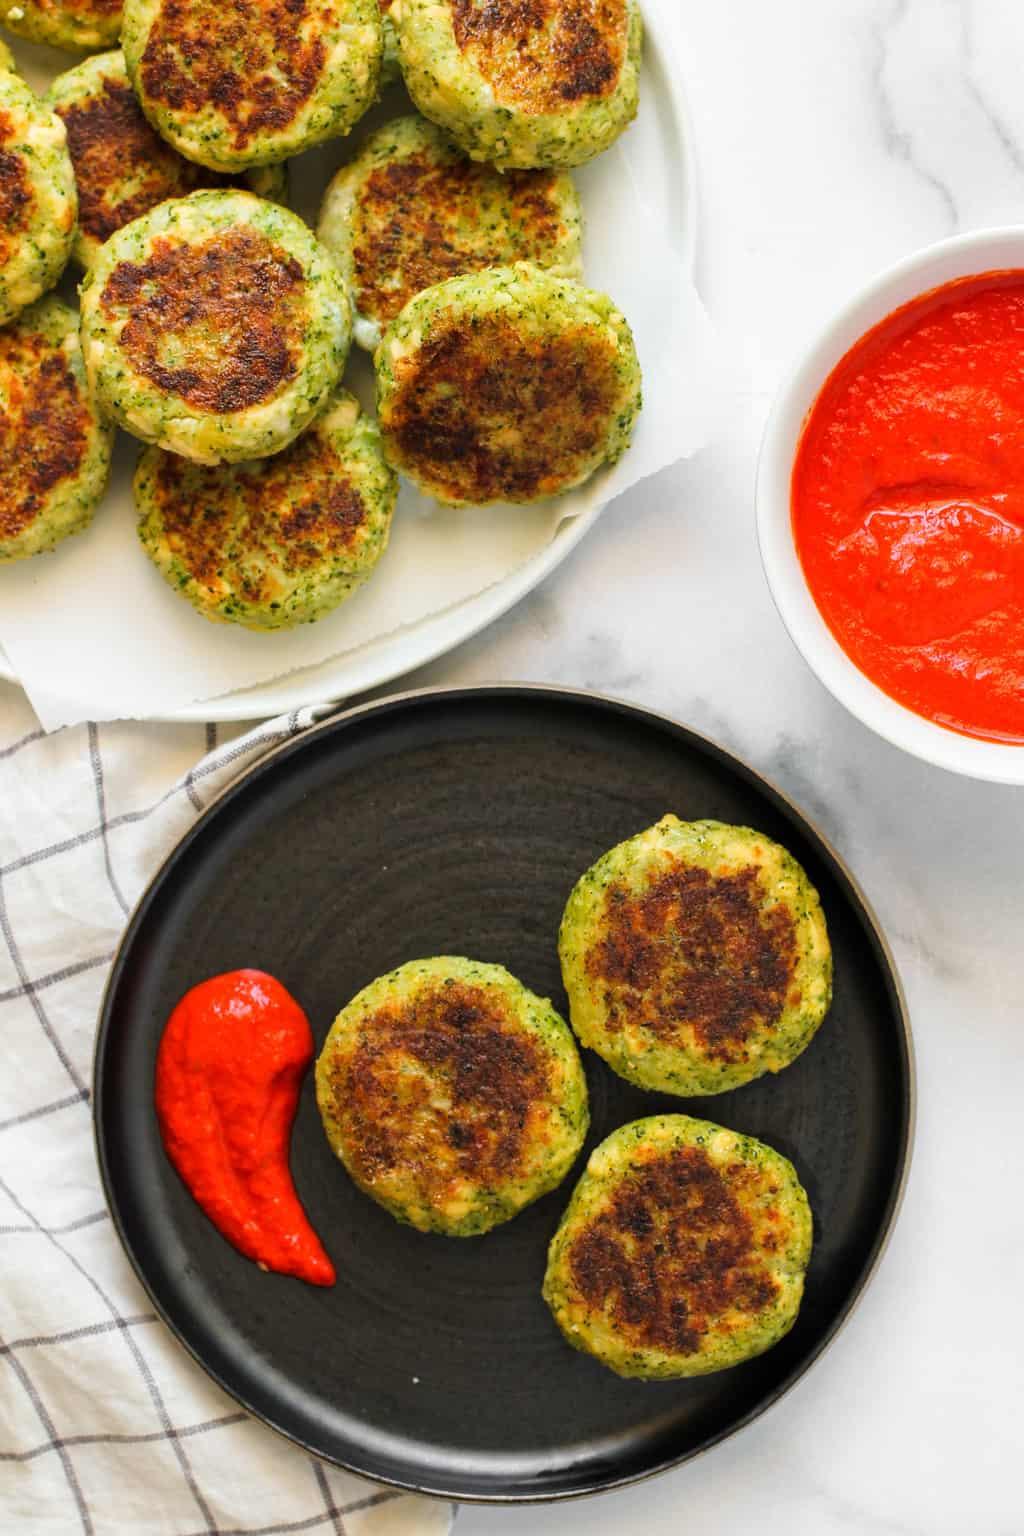 broccoli and tofu patties